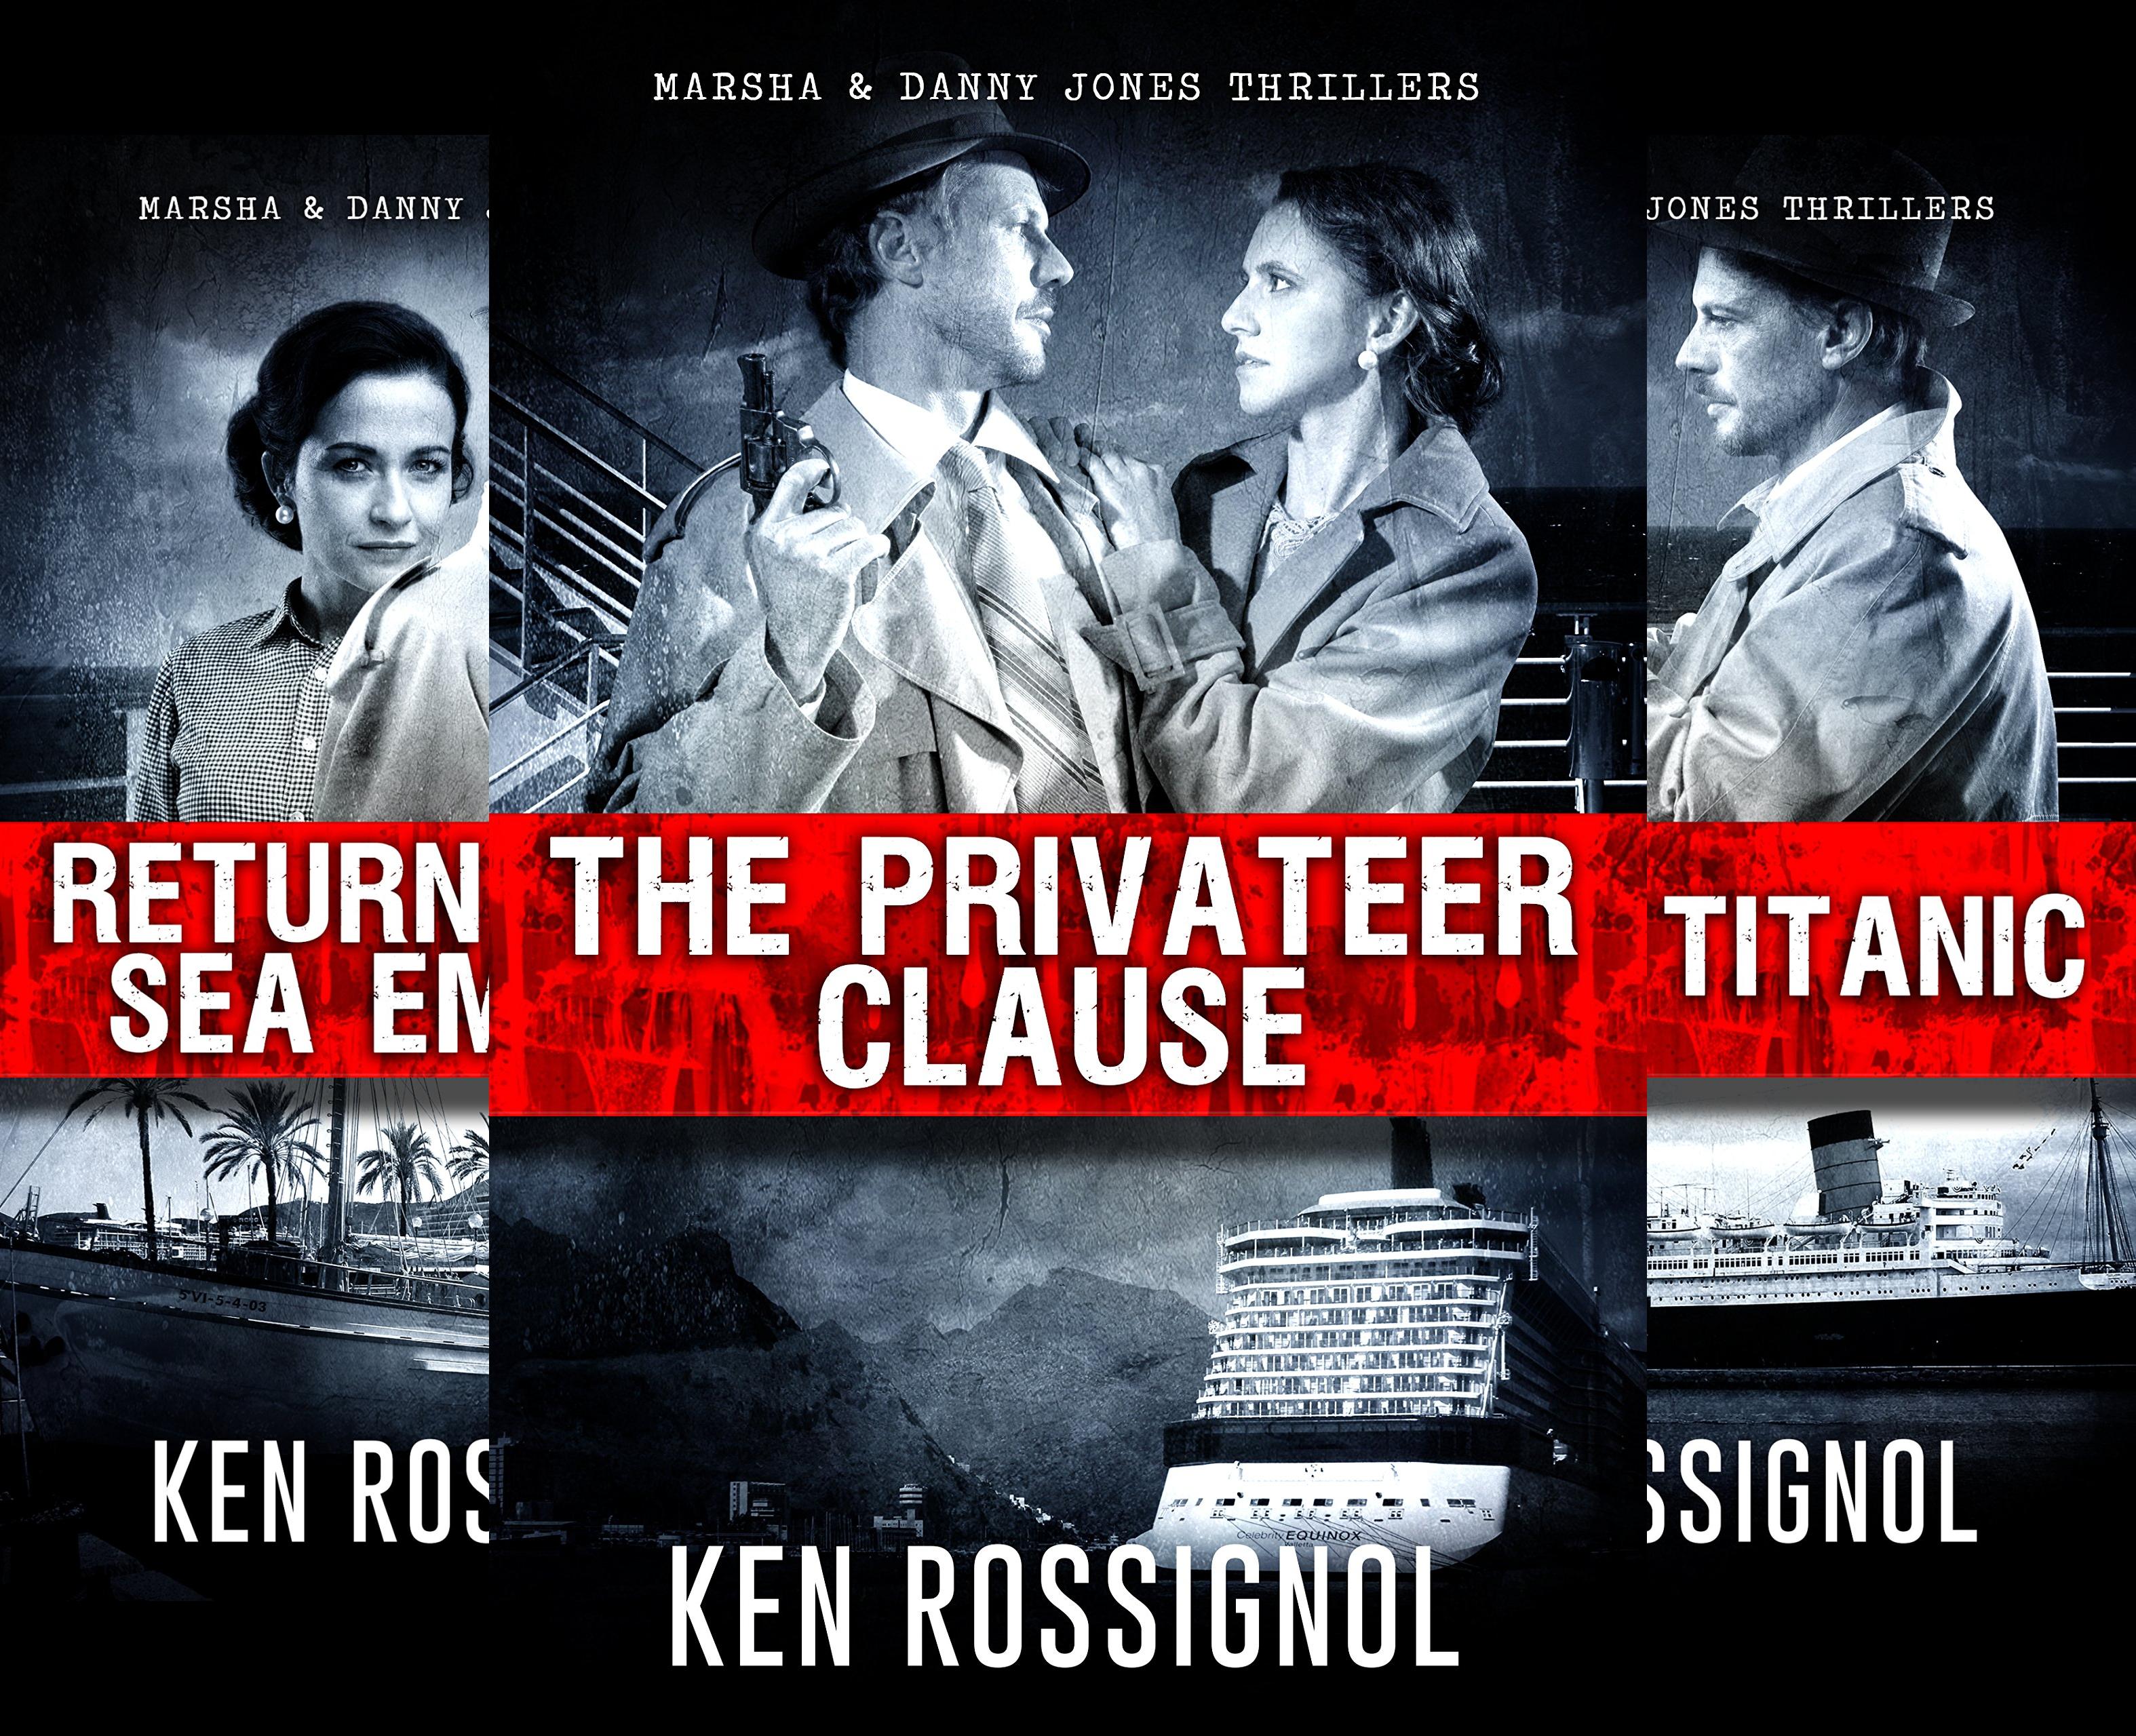 Marsha & Danny Jones Thriller (7 Book Series)